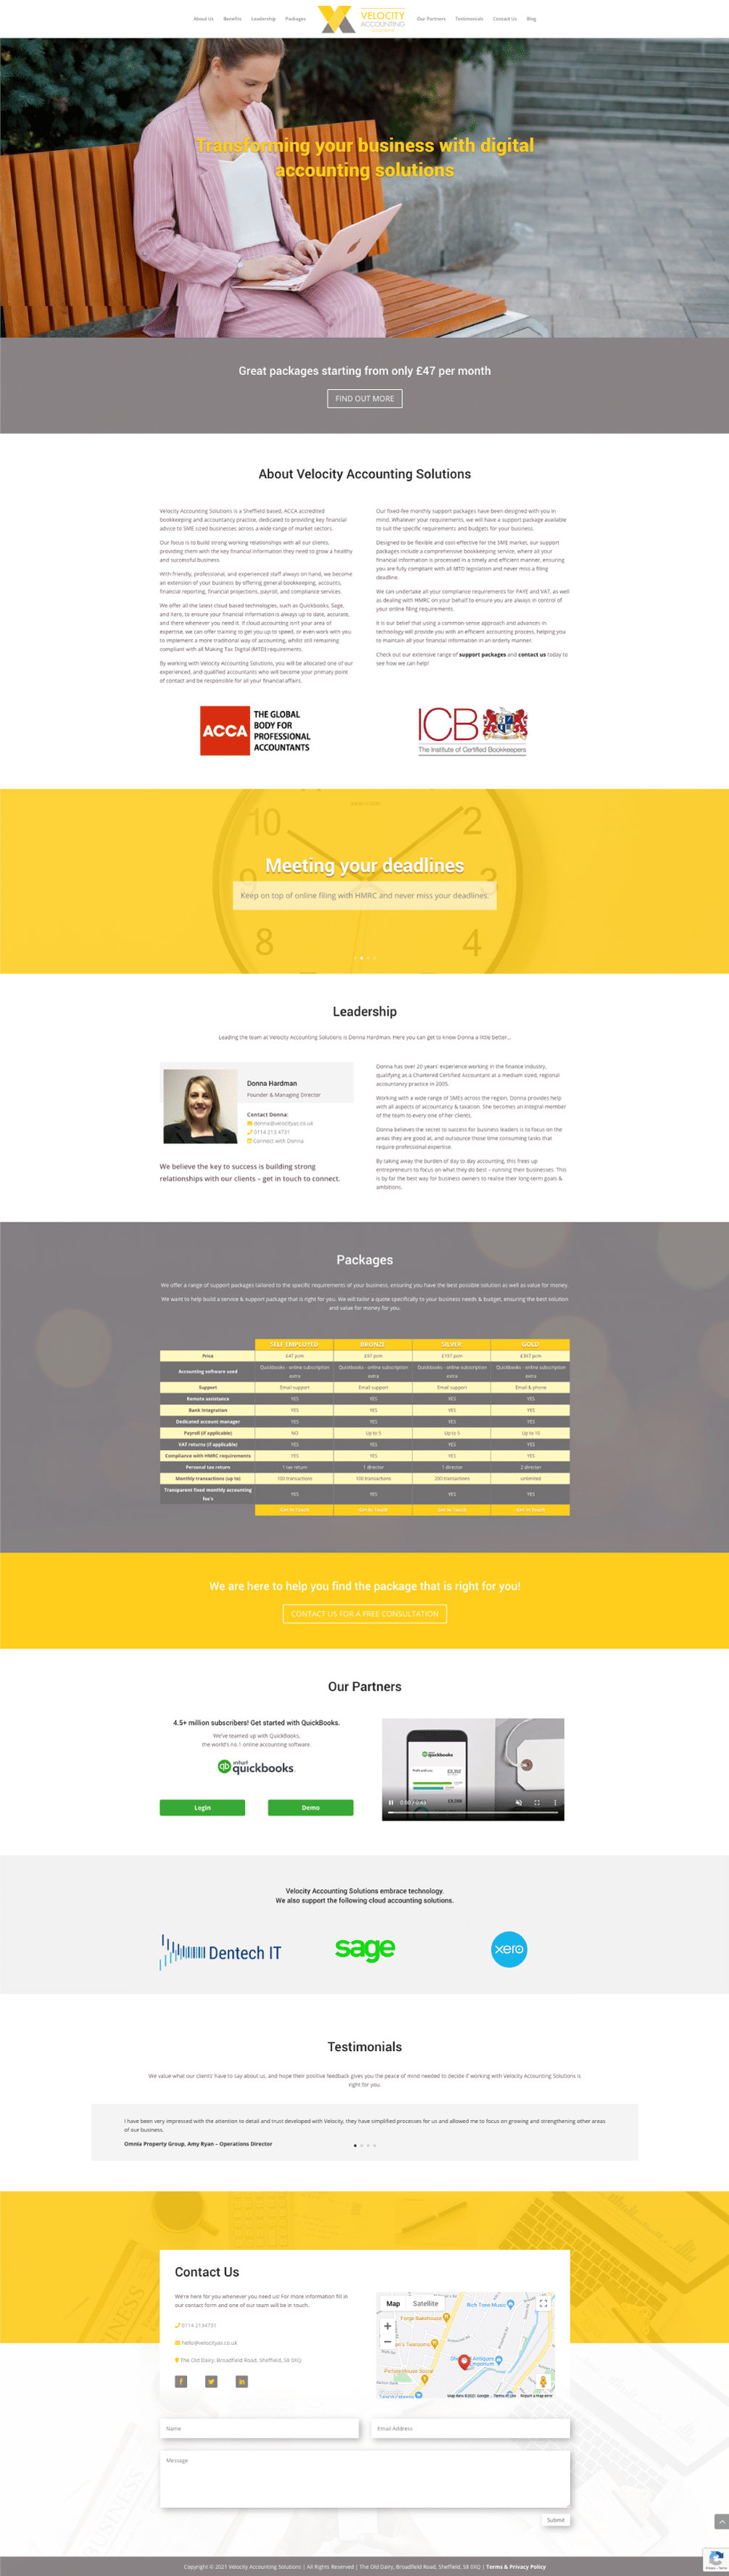 Velocity-page-layout